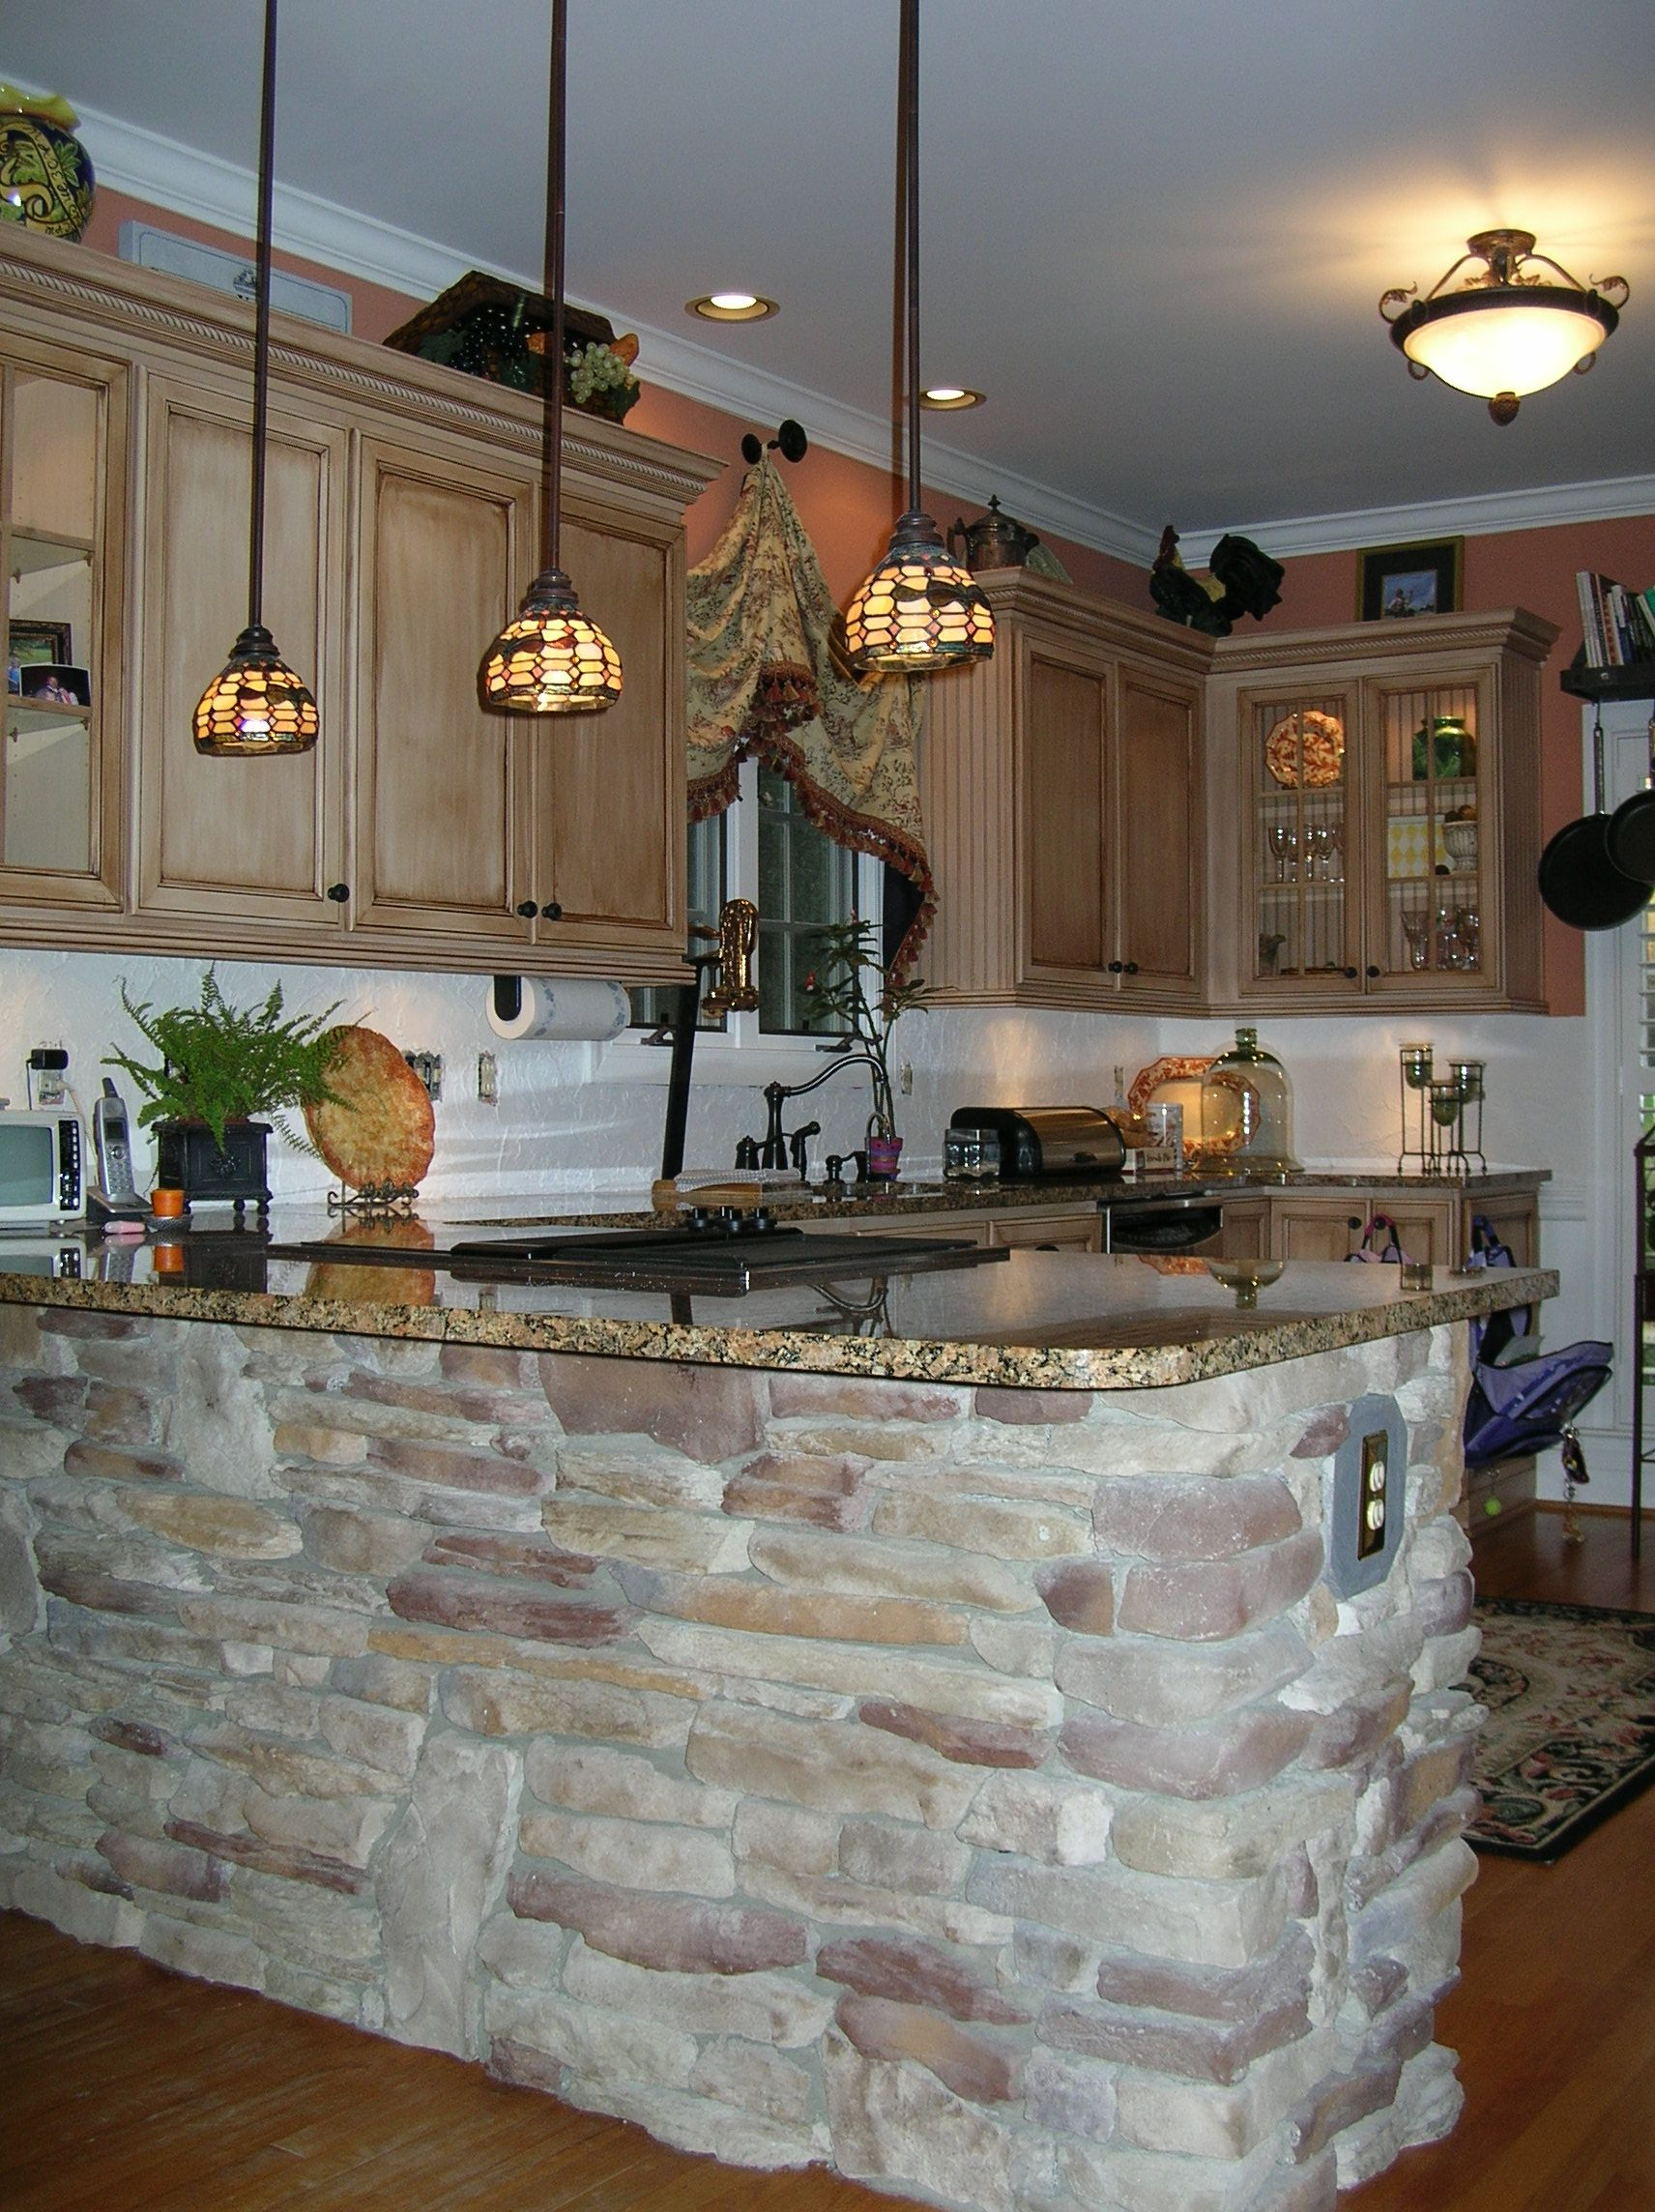 photos of rock and tile on interior kitchen bar Kitchen